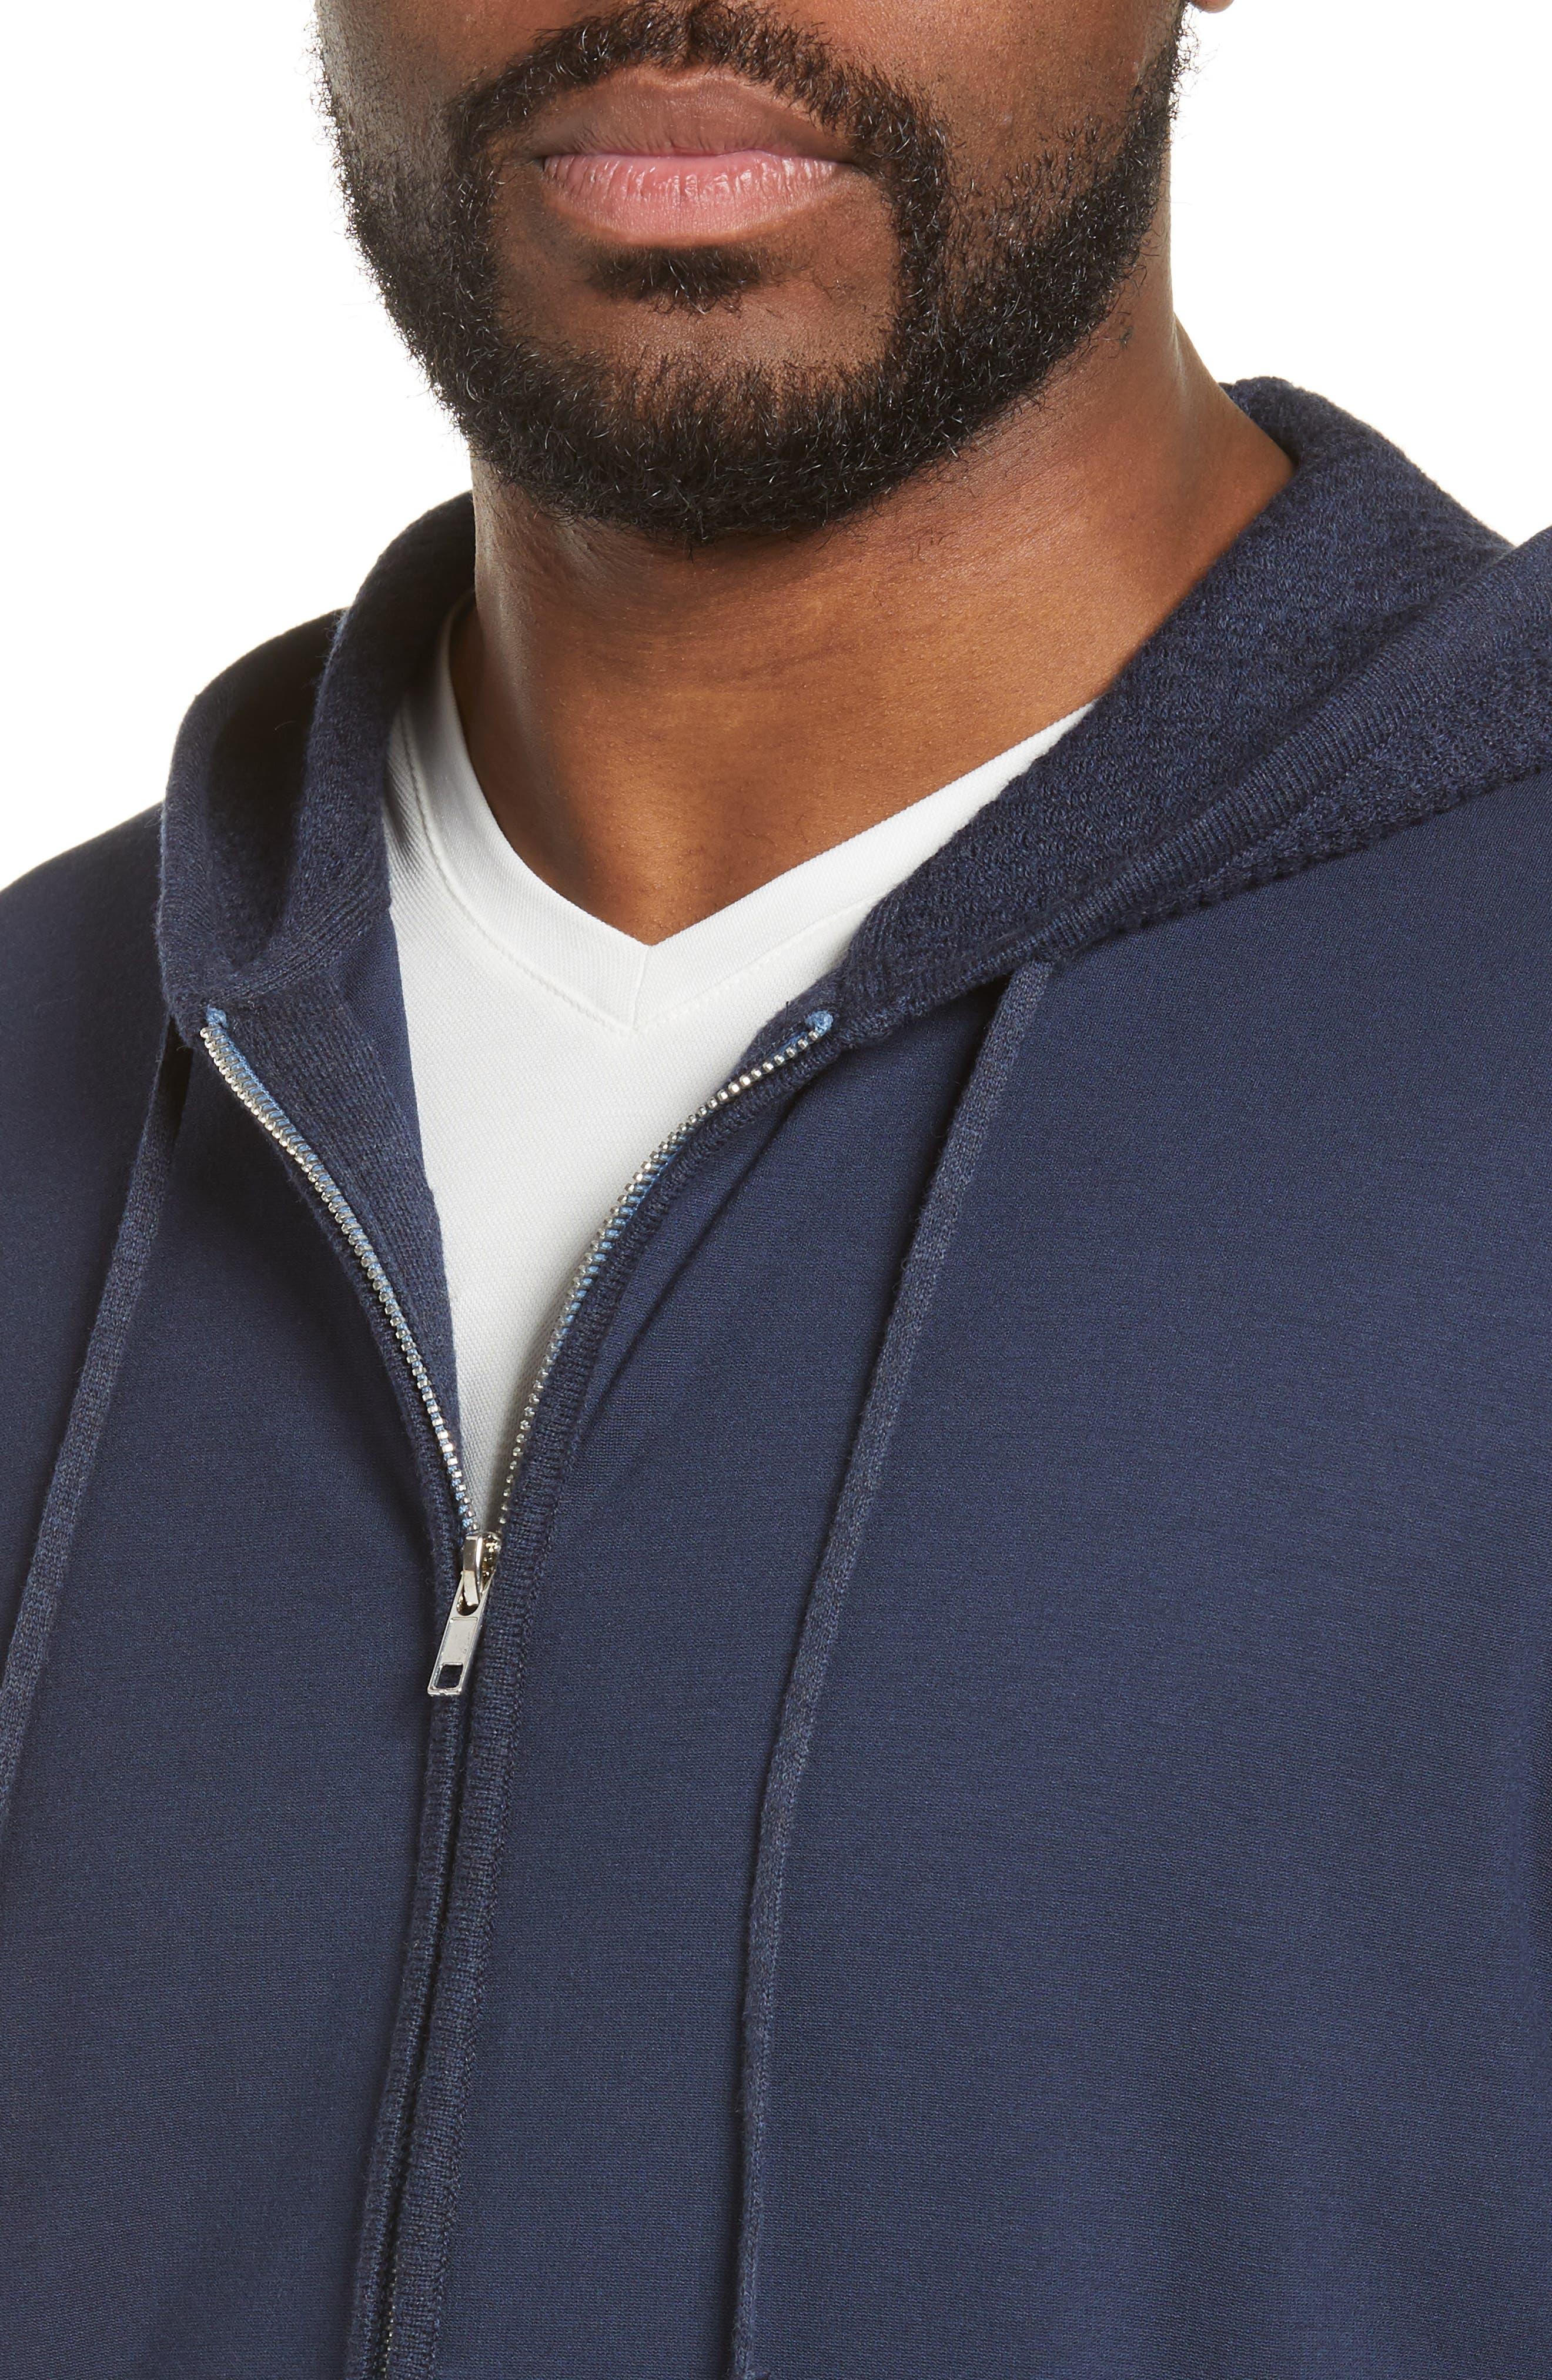 ZACHARY PRELL, Cedarhurst Hooded Zip Sweater, Alternate thumbnail 5, color, NAVY